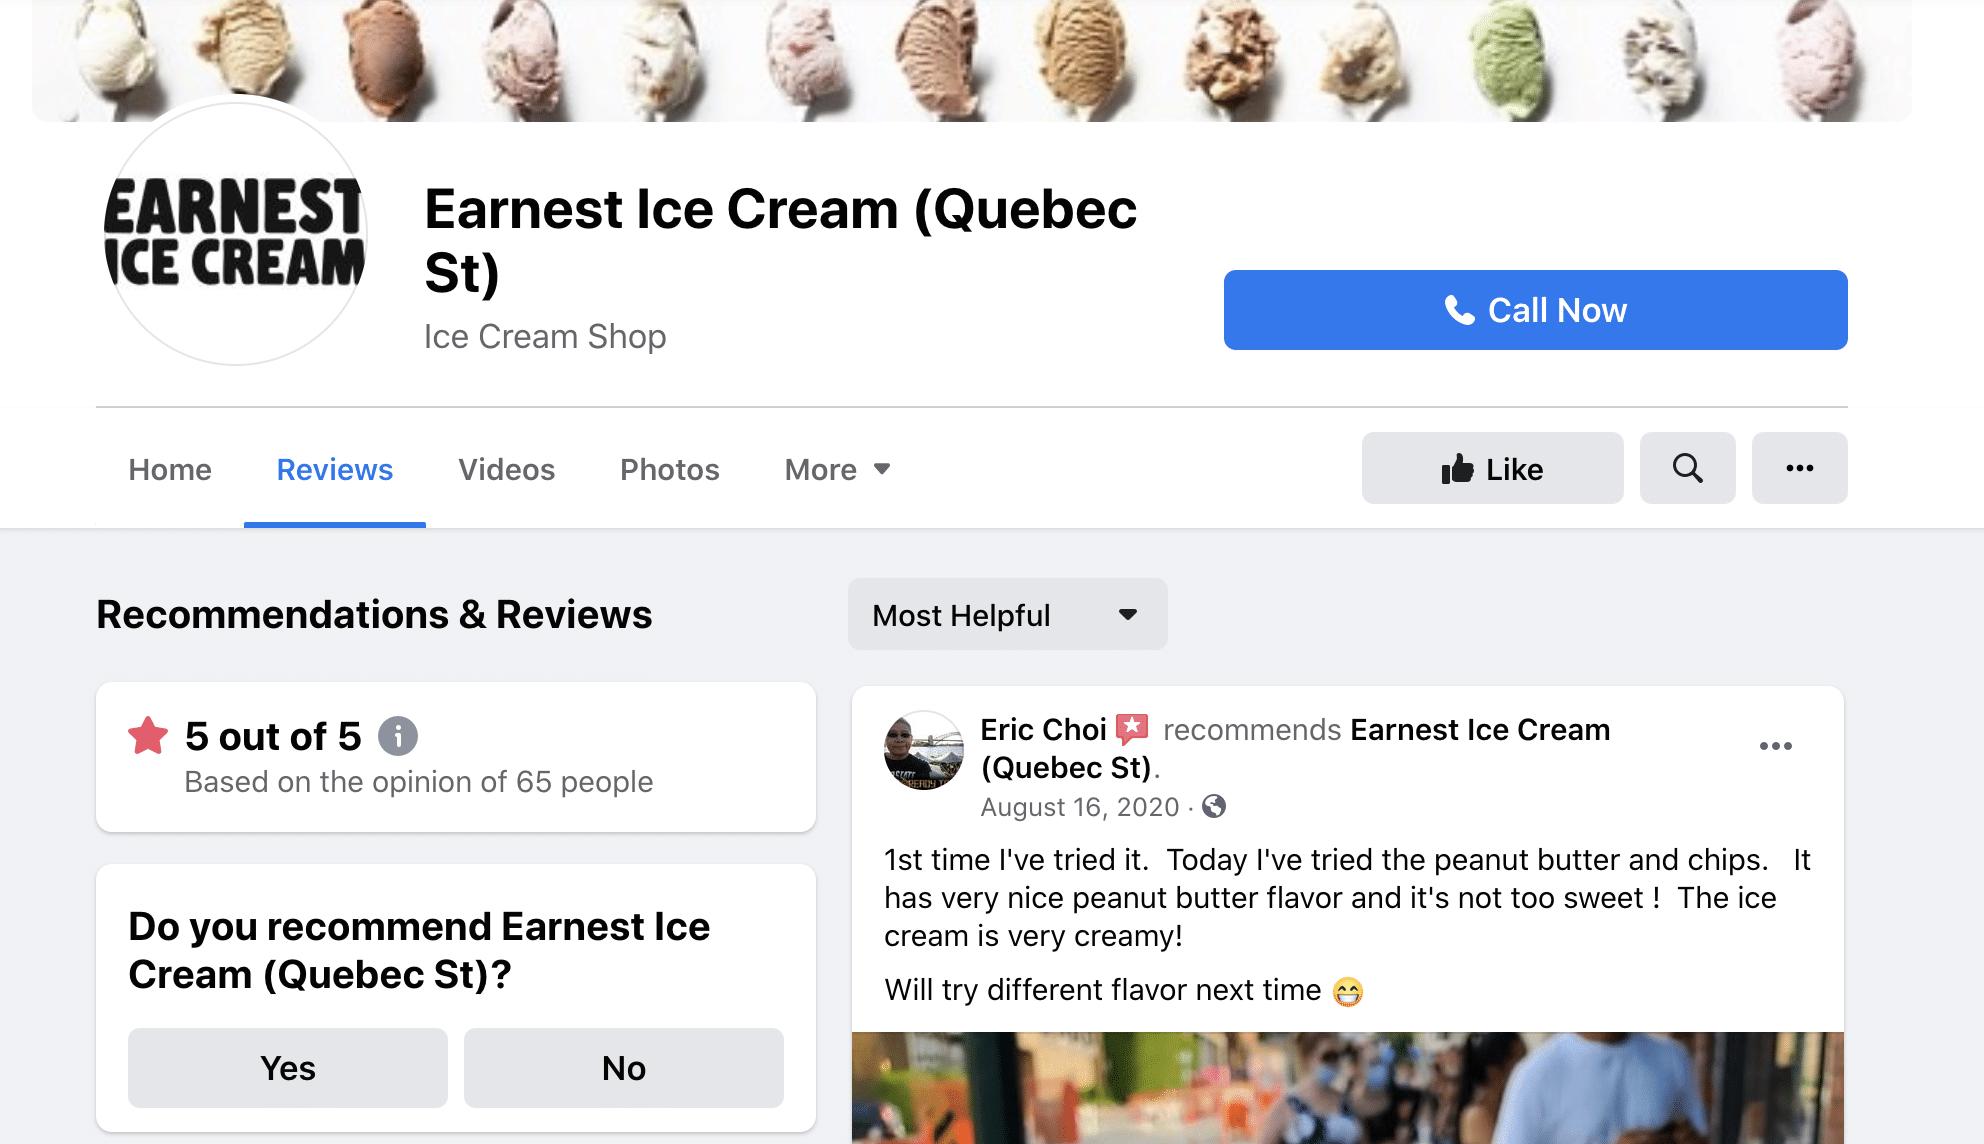 Earnest Ice Cream customer testimonials